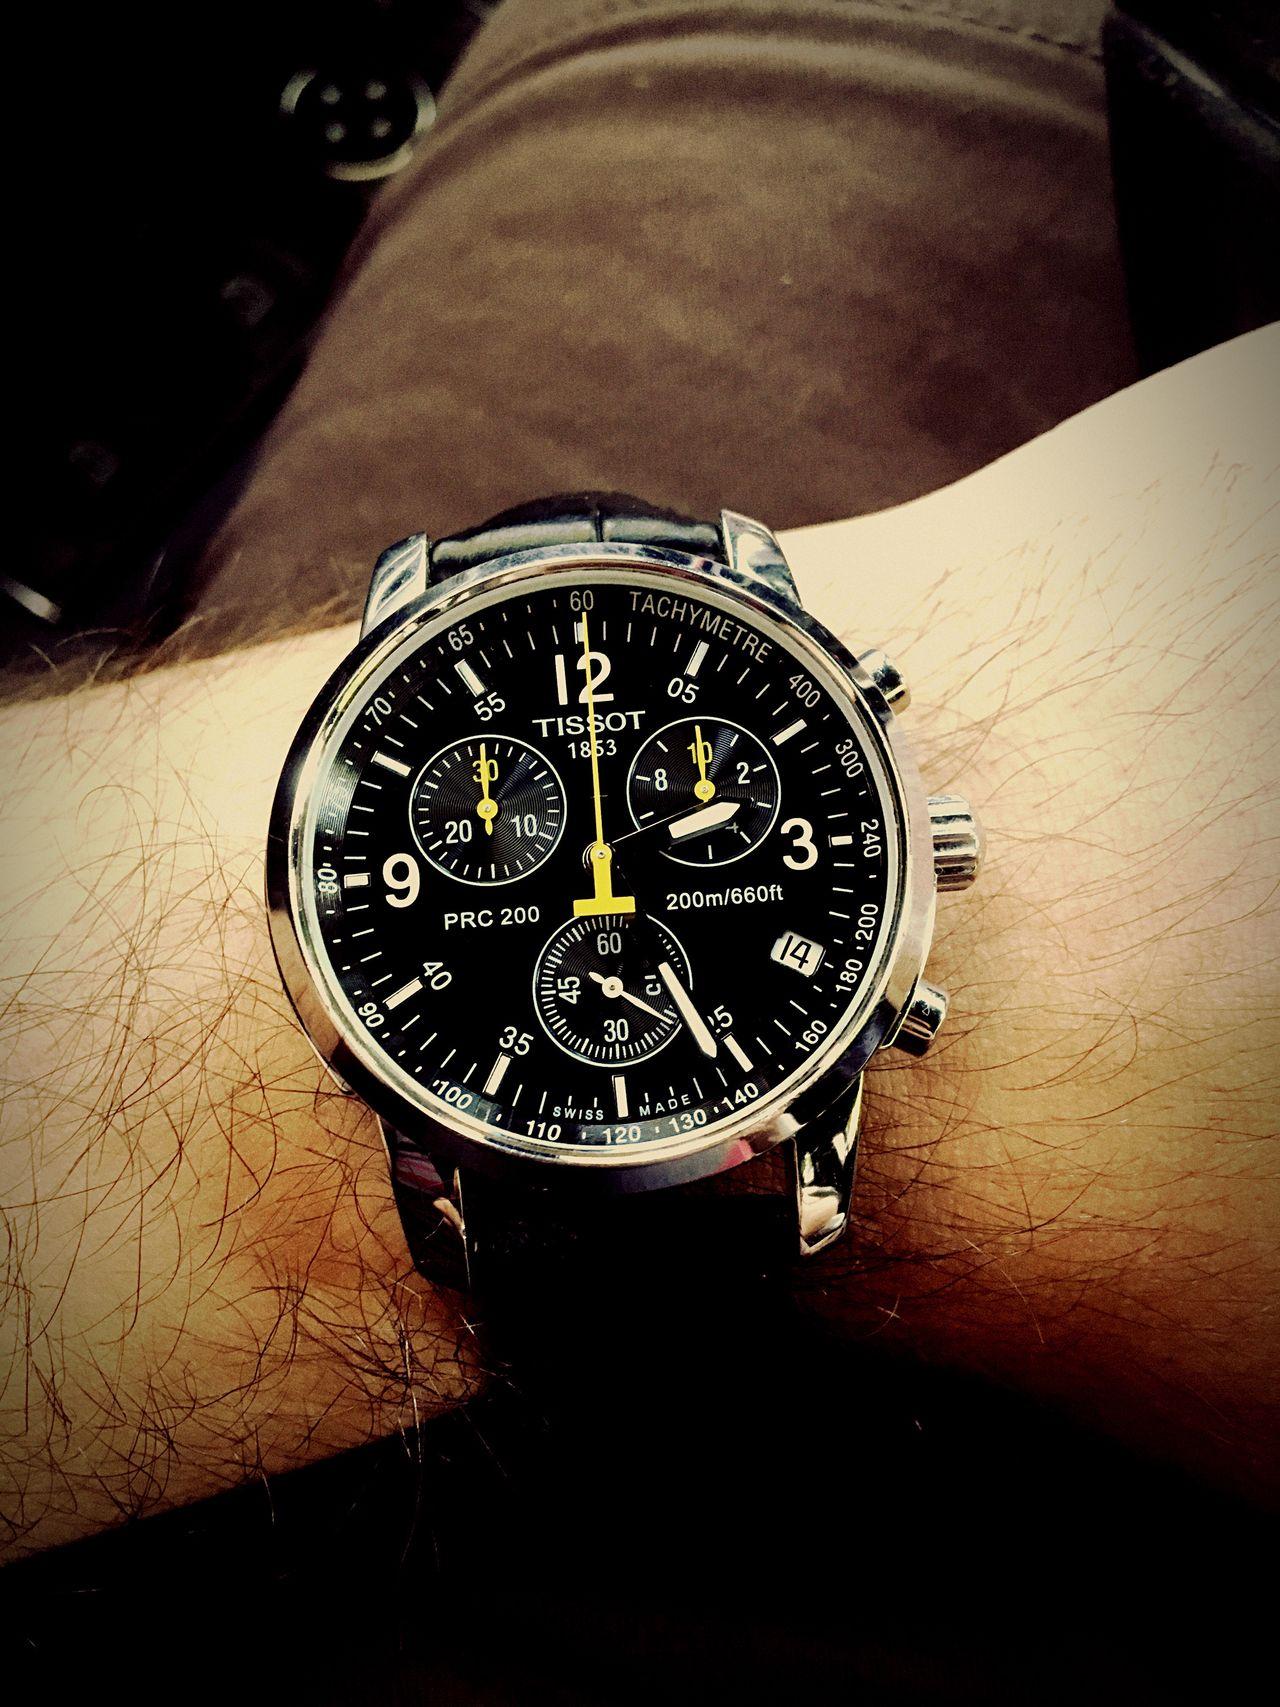 Tissot Prc 200 Tissot Watch Watchcollector Passion Lifestyle Swisswatch Swissmade Mine Close-up